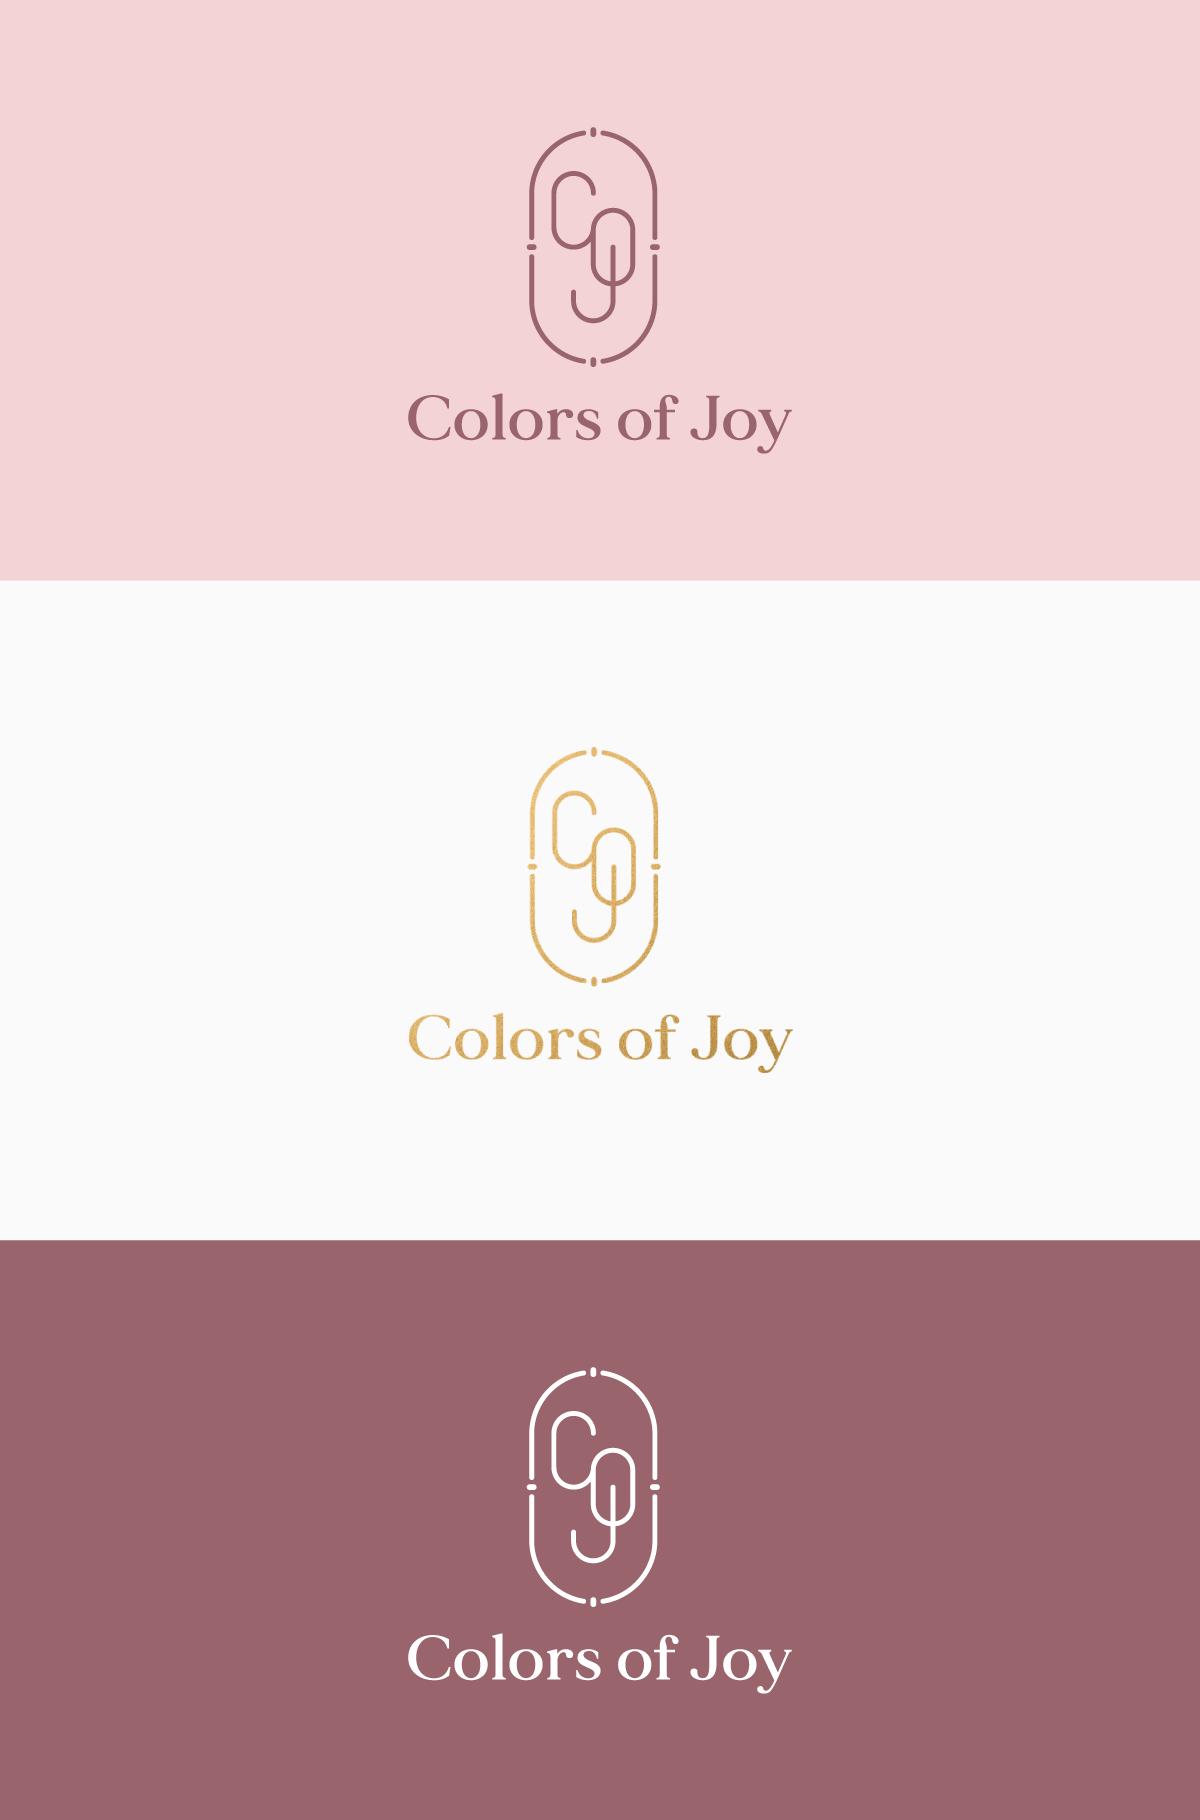 olors of Joy logo varianter